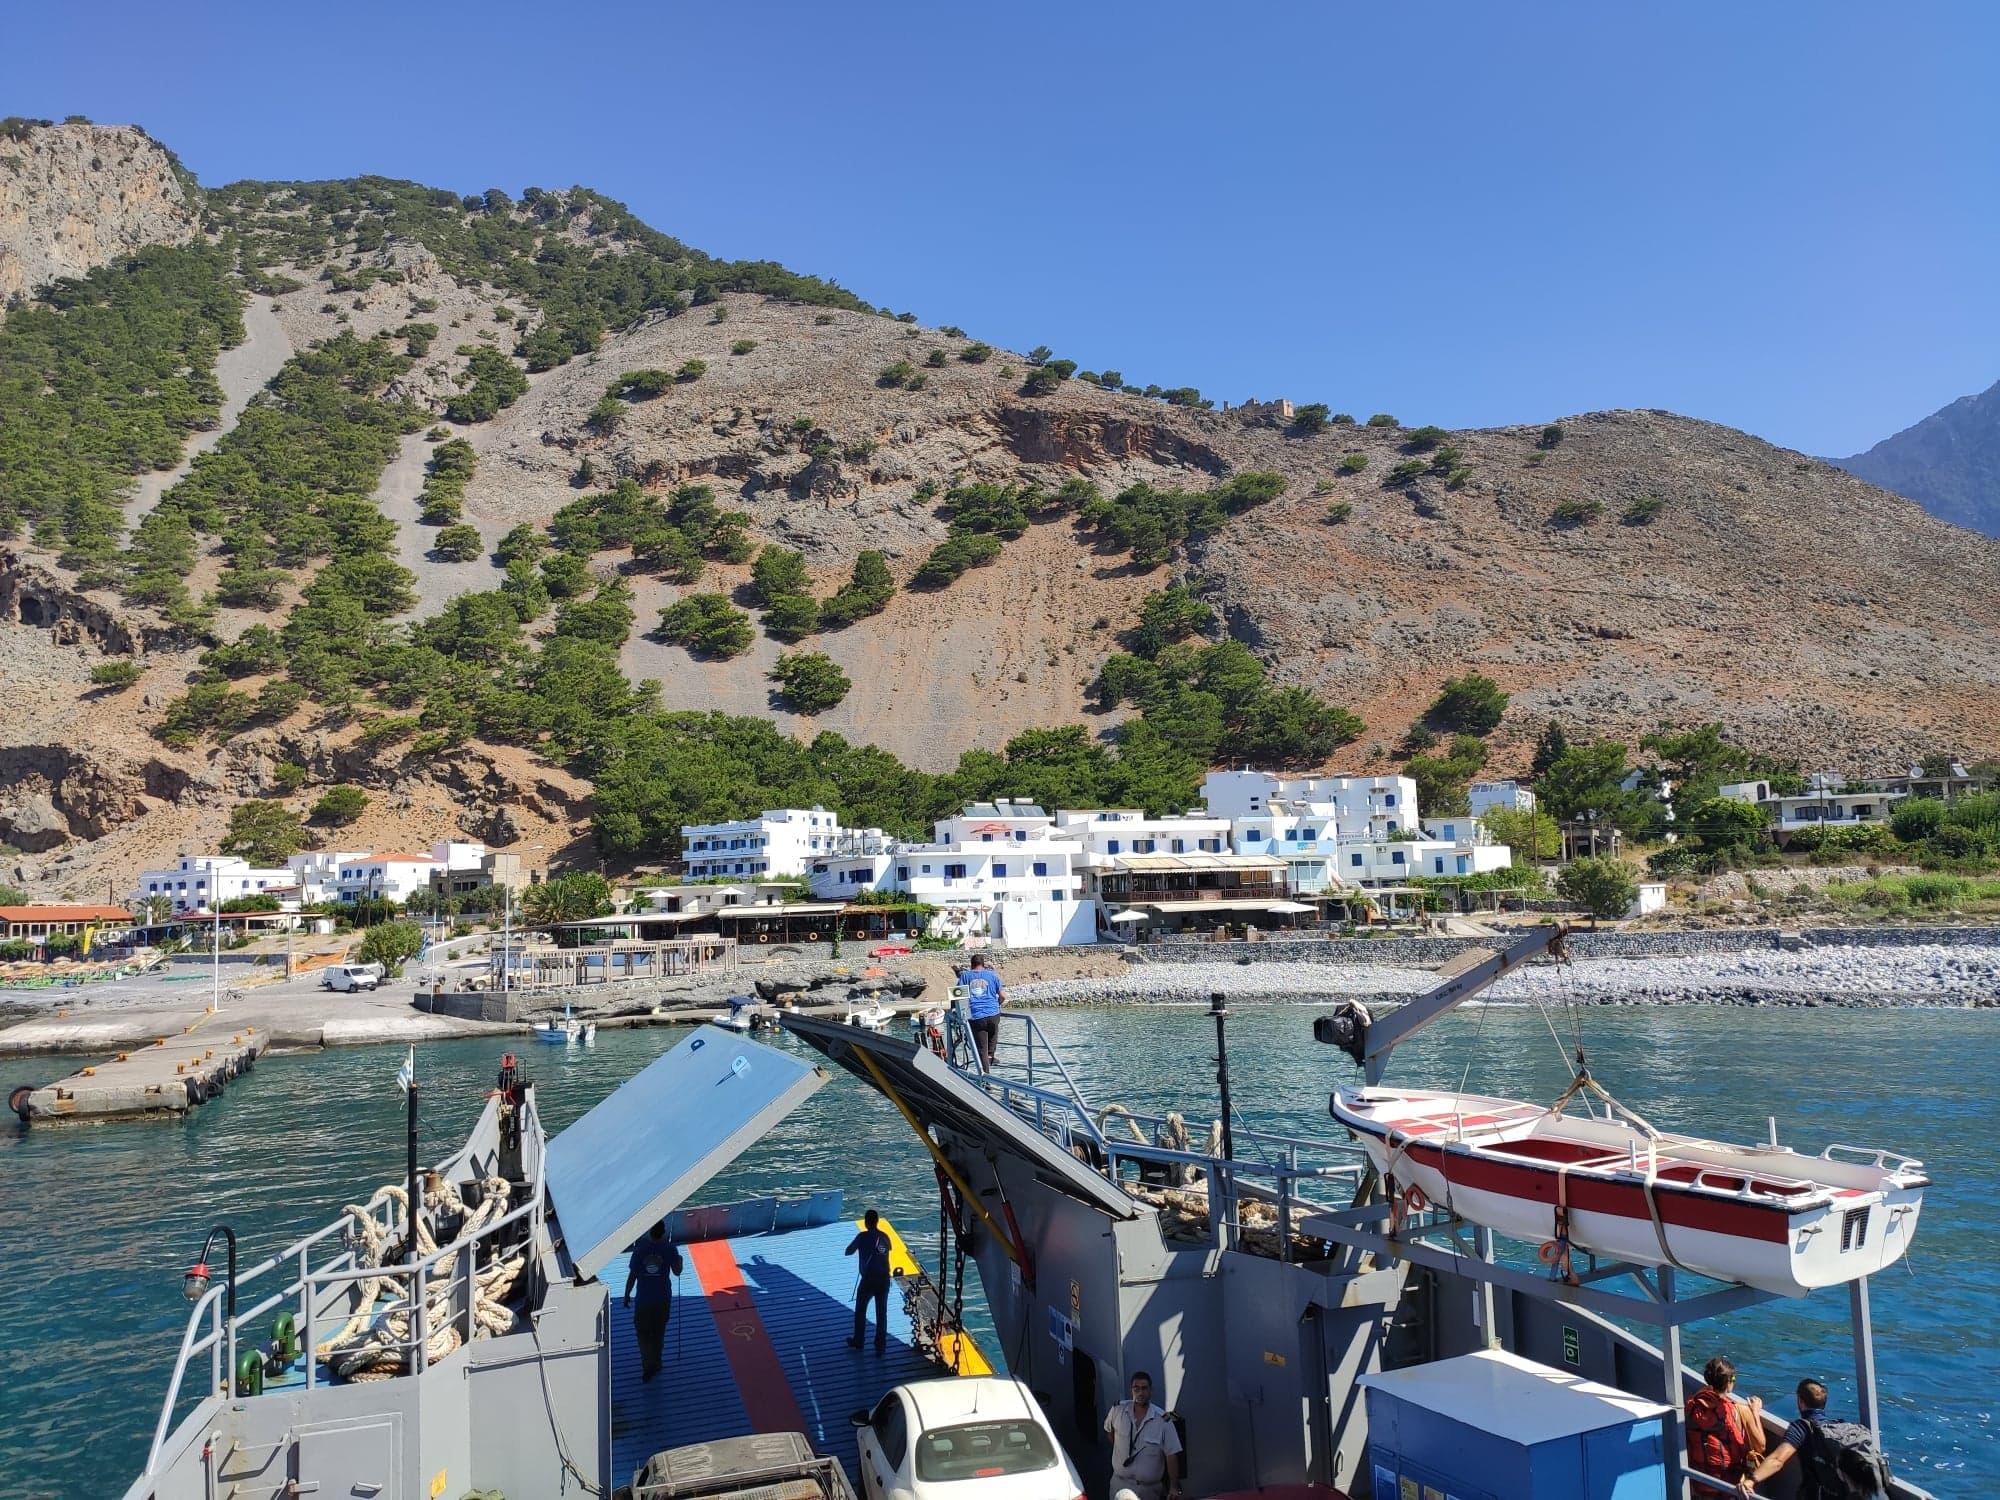 Ferry from Agia roumeli